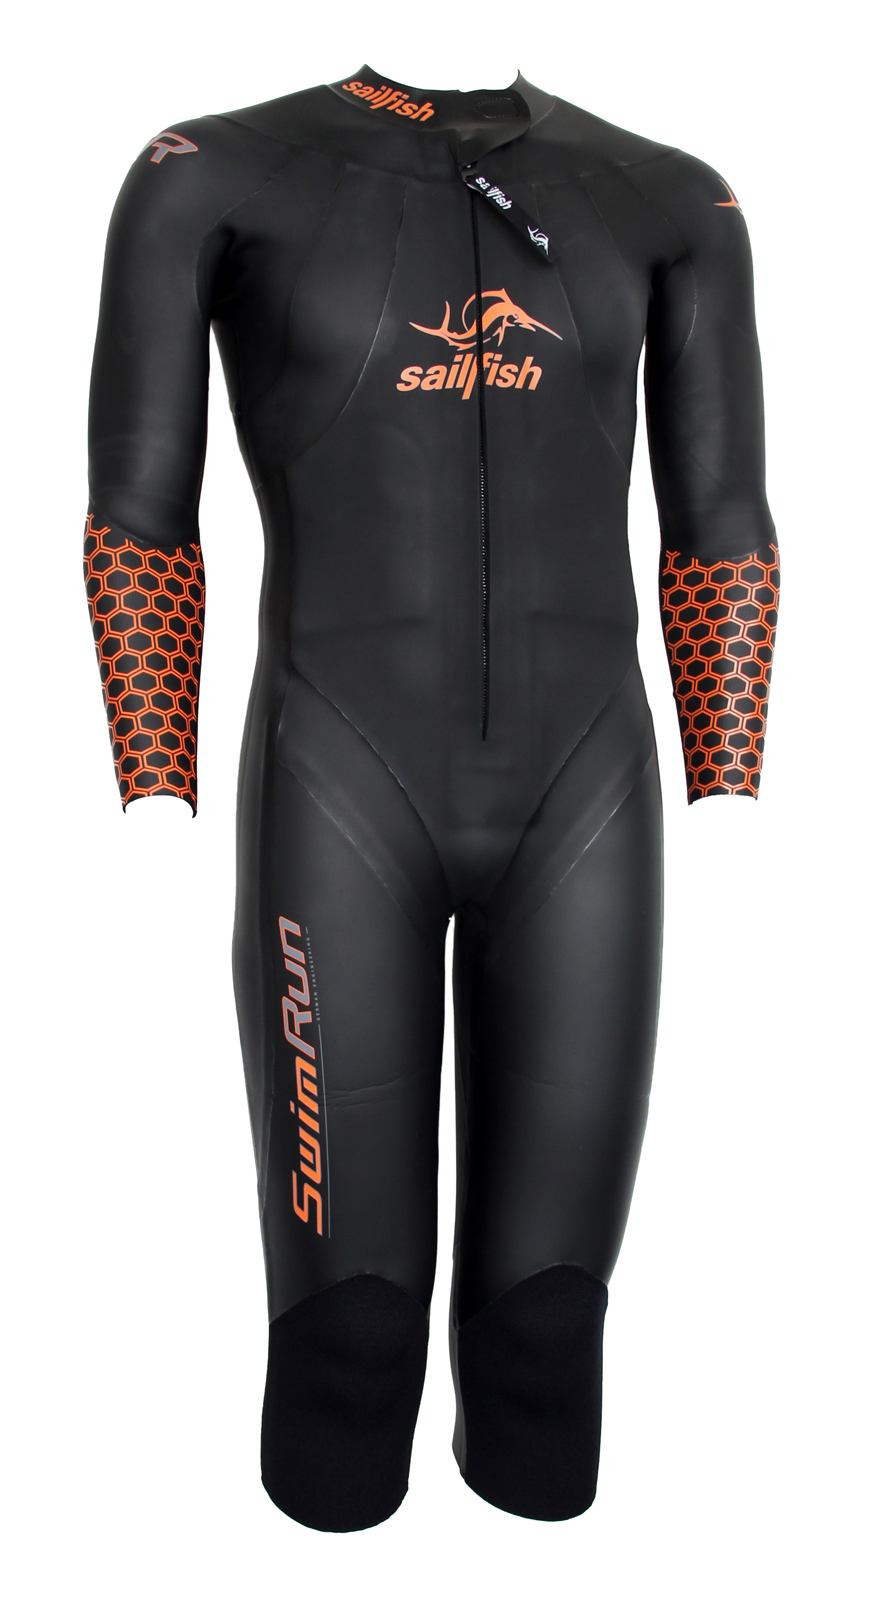 Sailfish mit neuem SwimRun-Anzug